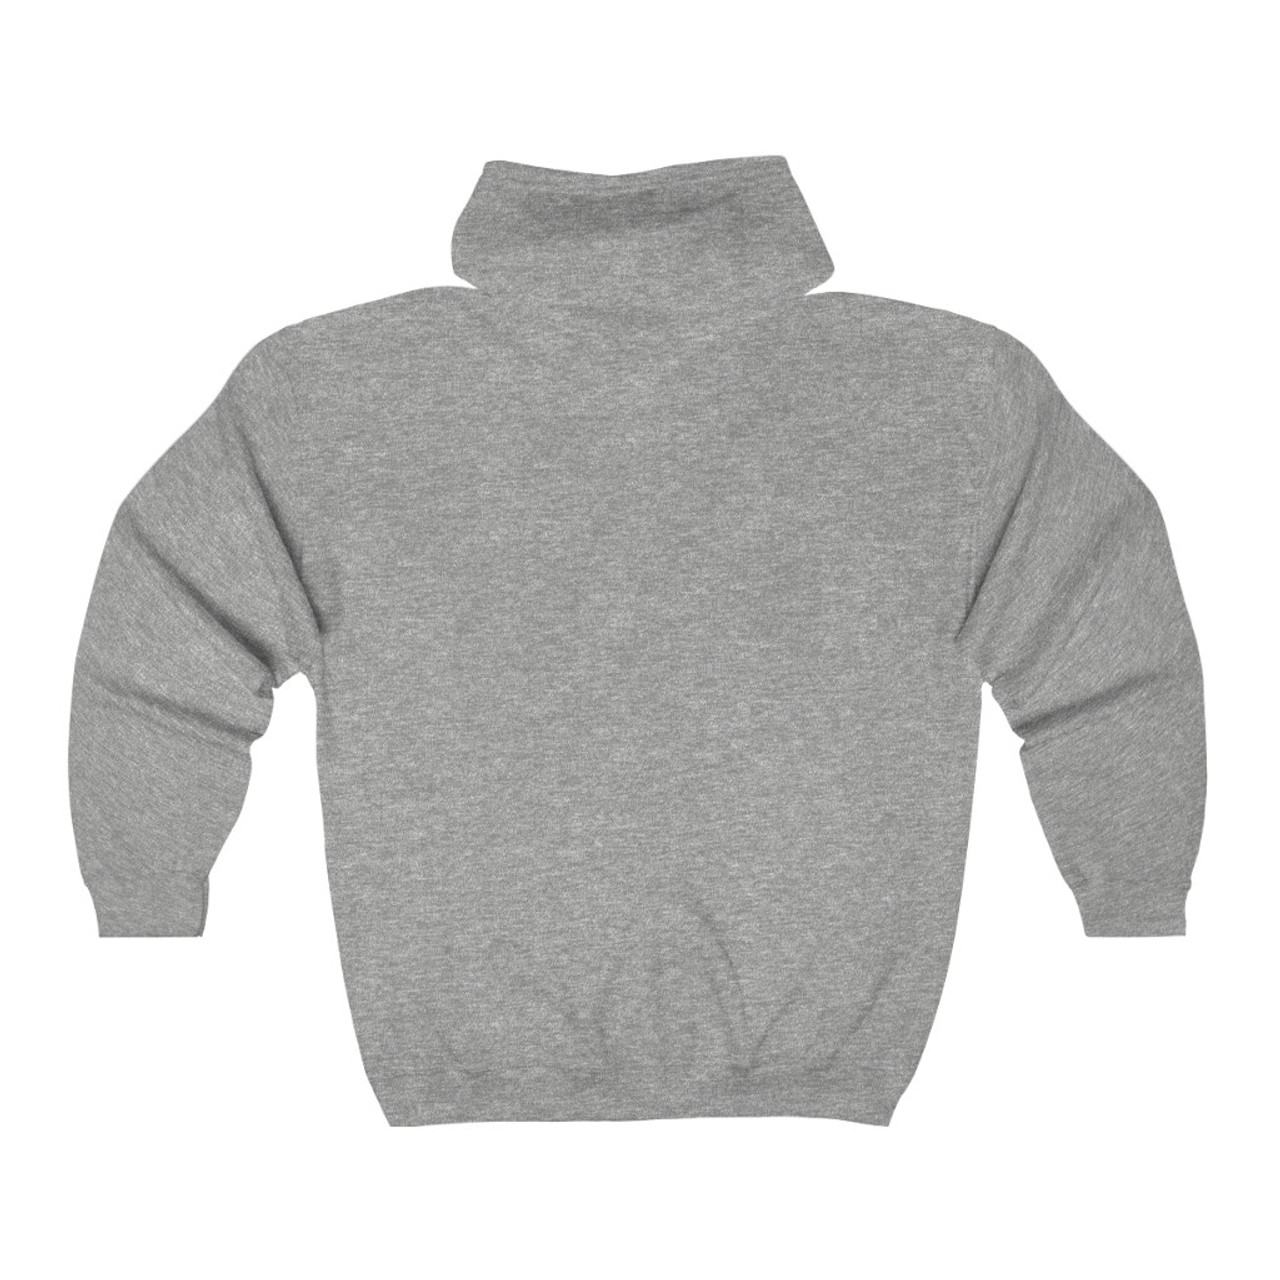 "Unisex Sports Gray ""Patch Logo"" Full Zip Hooded Sweatshirt"